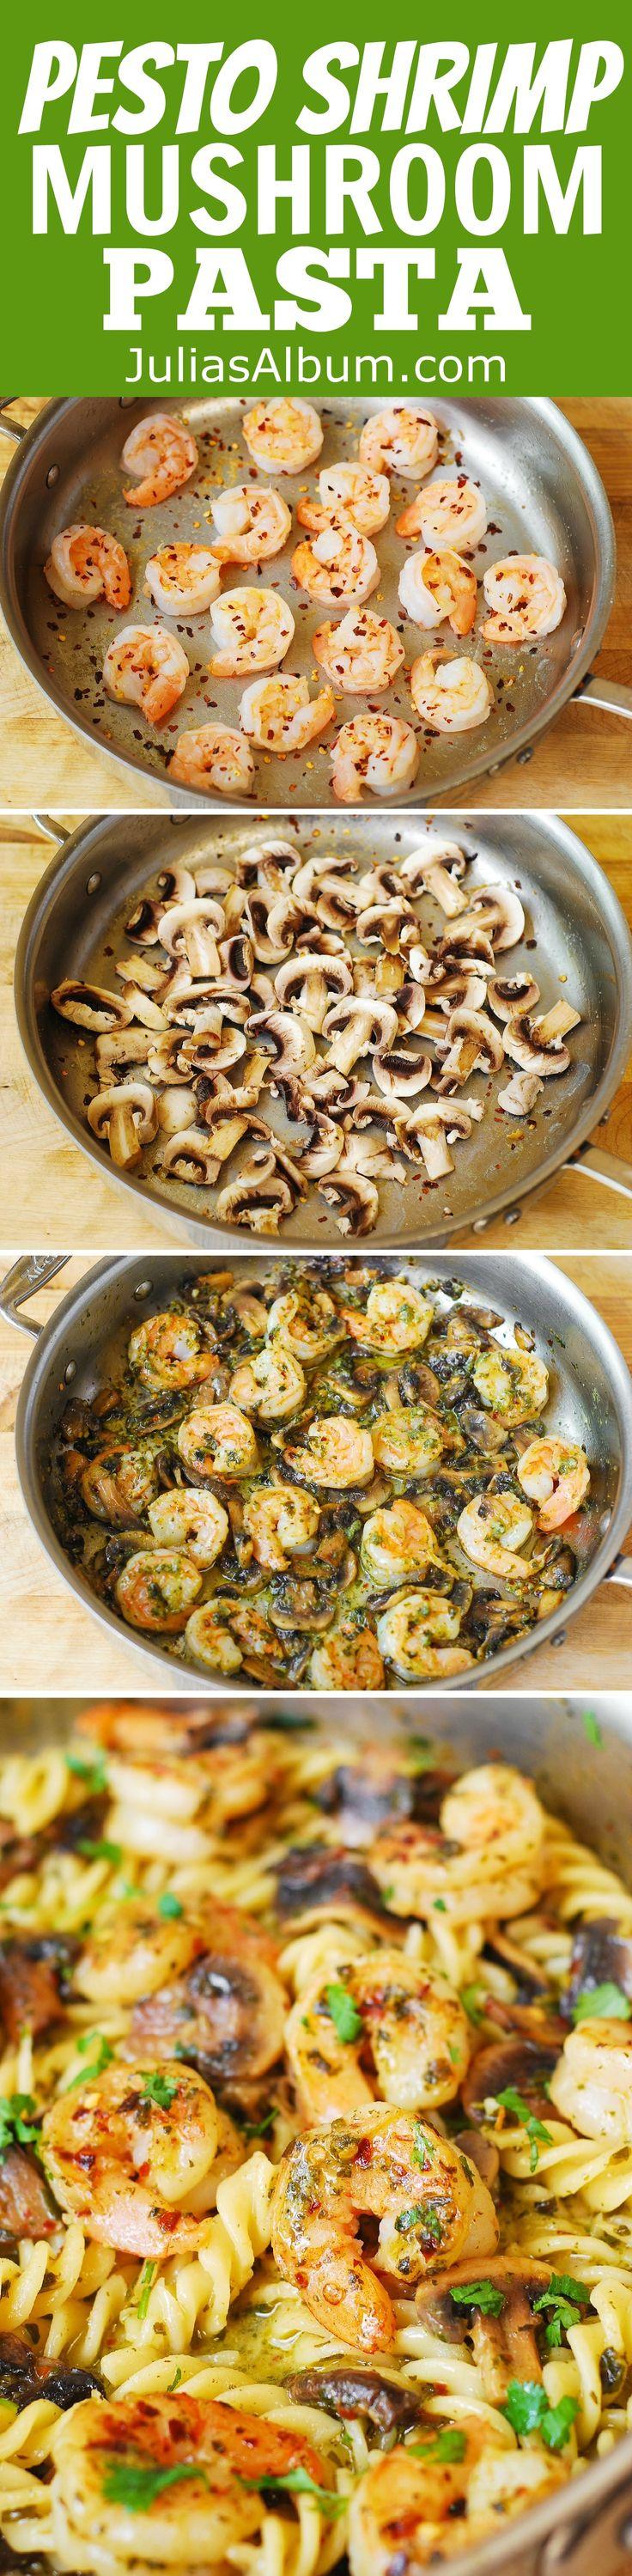 Pesto Shrimp Mushroom Pasta